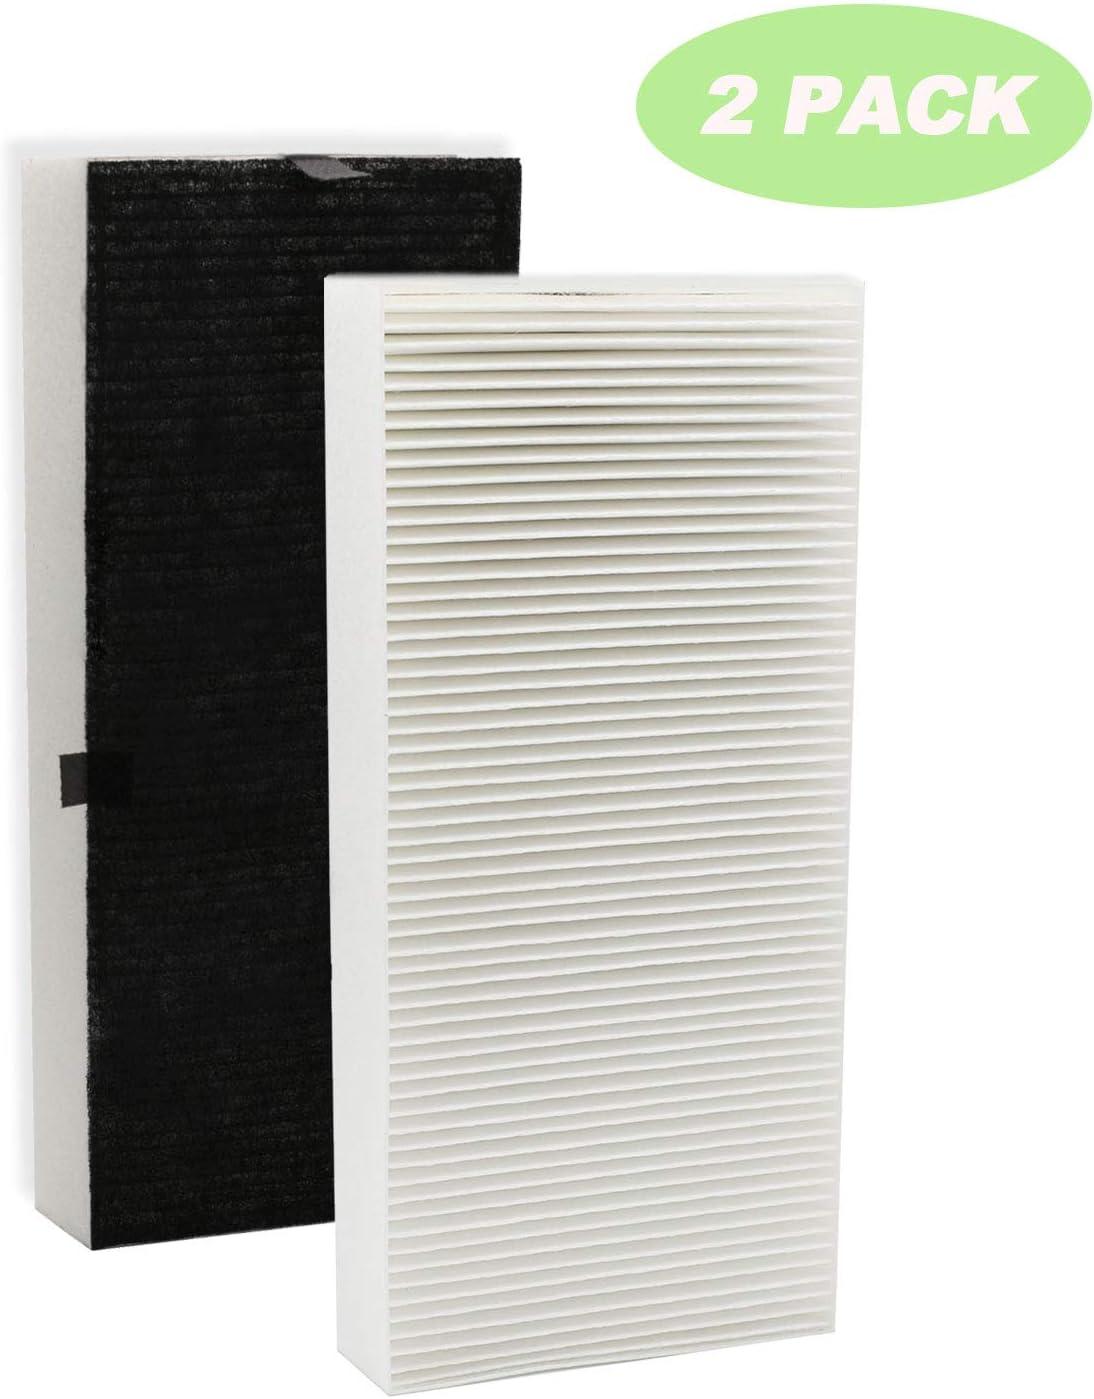 IOYIJOI 2 Pack Filter U Replacement for Febreze FRF102B Honeywell Filter HHT270, HHT290 Series